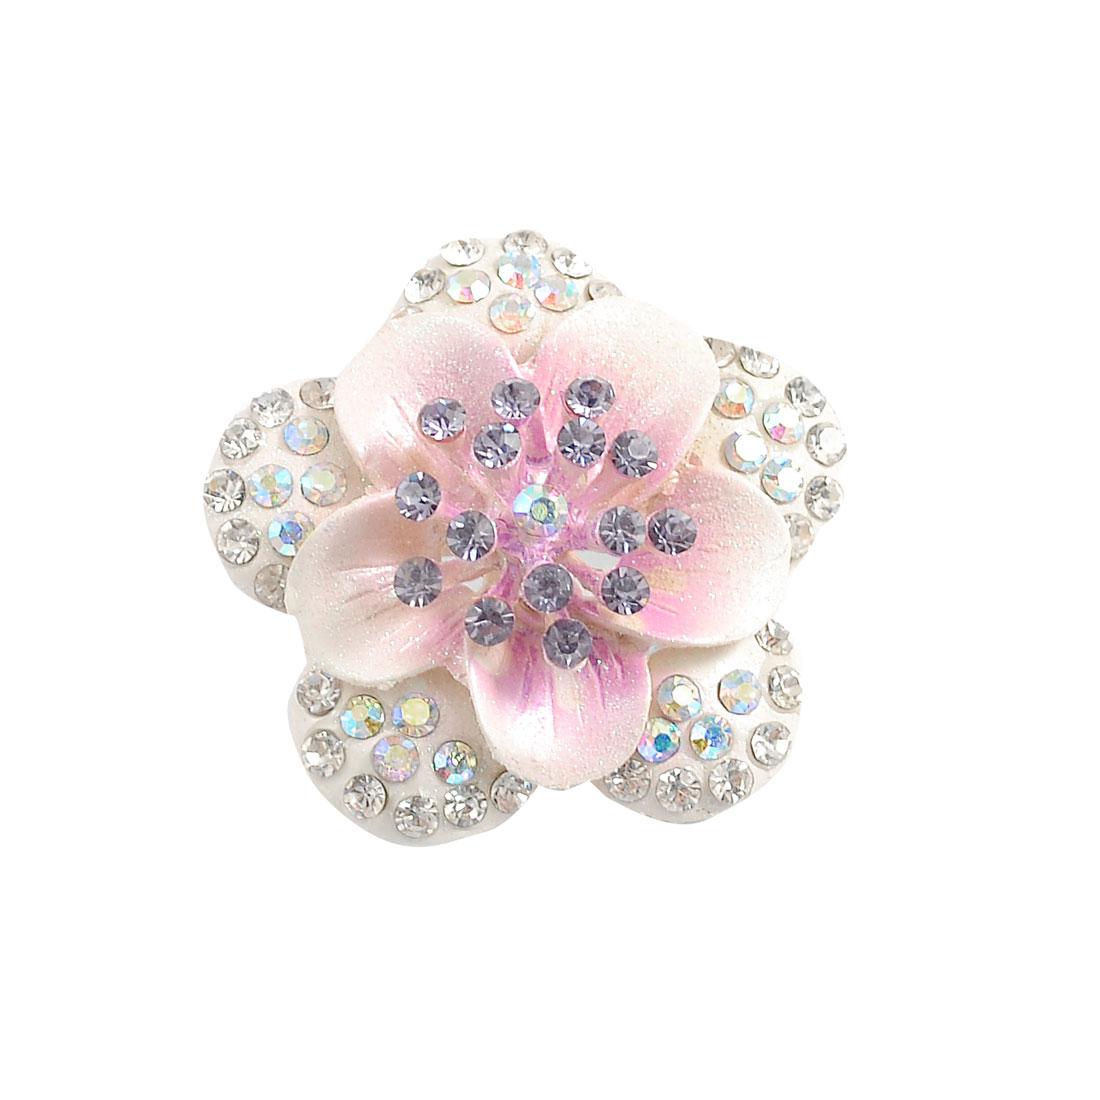 Ladies Purple Shiny Plastic Rhinestone Accent Flower Brooch Apparel Decor